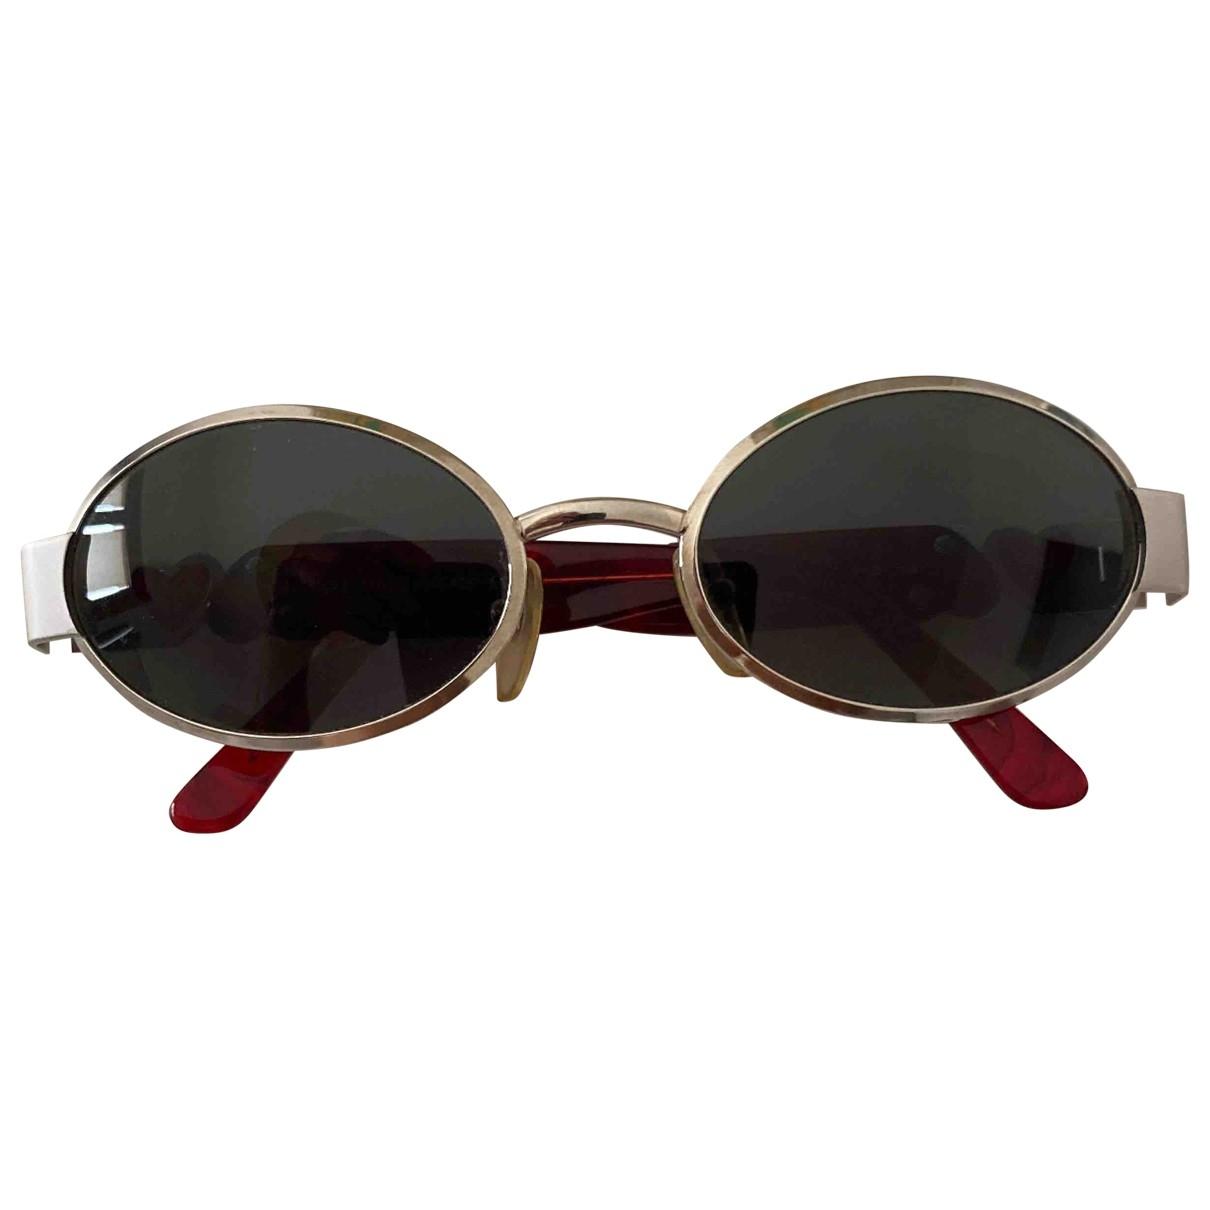 Moschino \N Sonnenbrillen in  Grau Metall